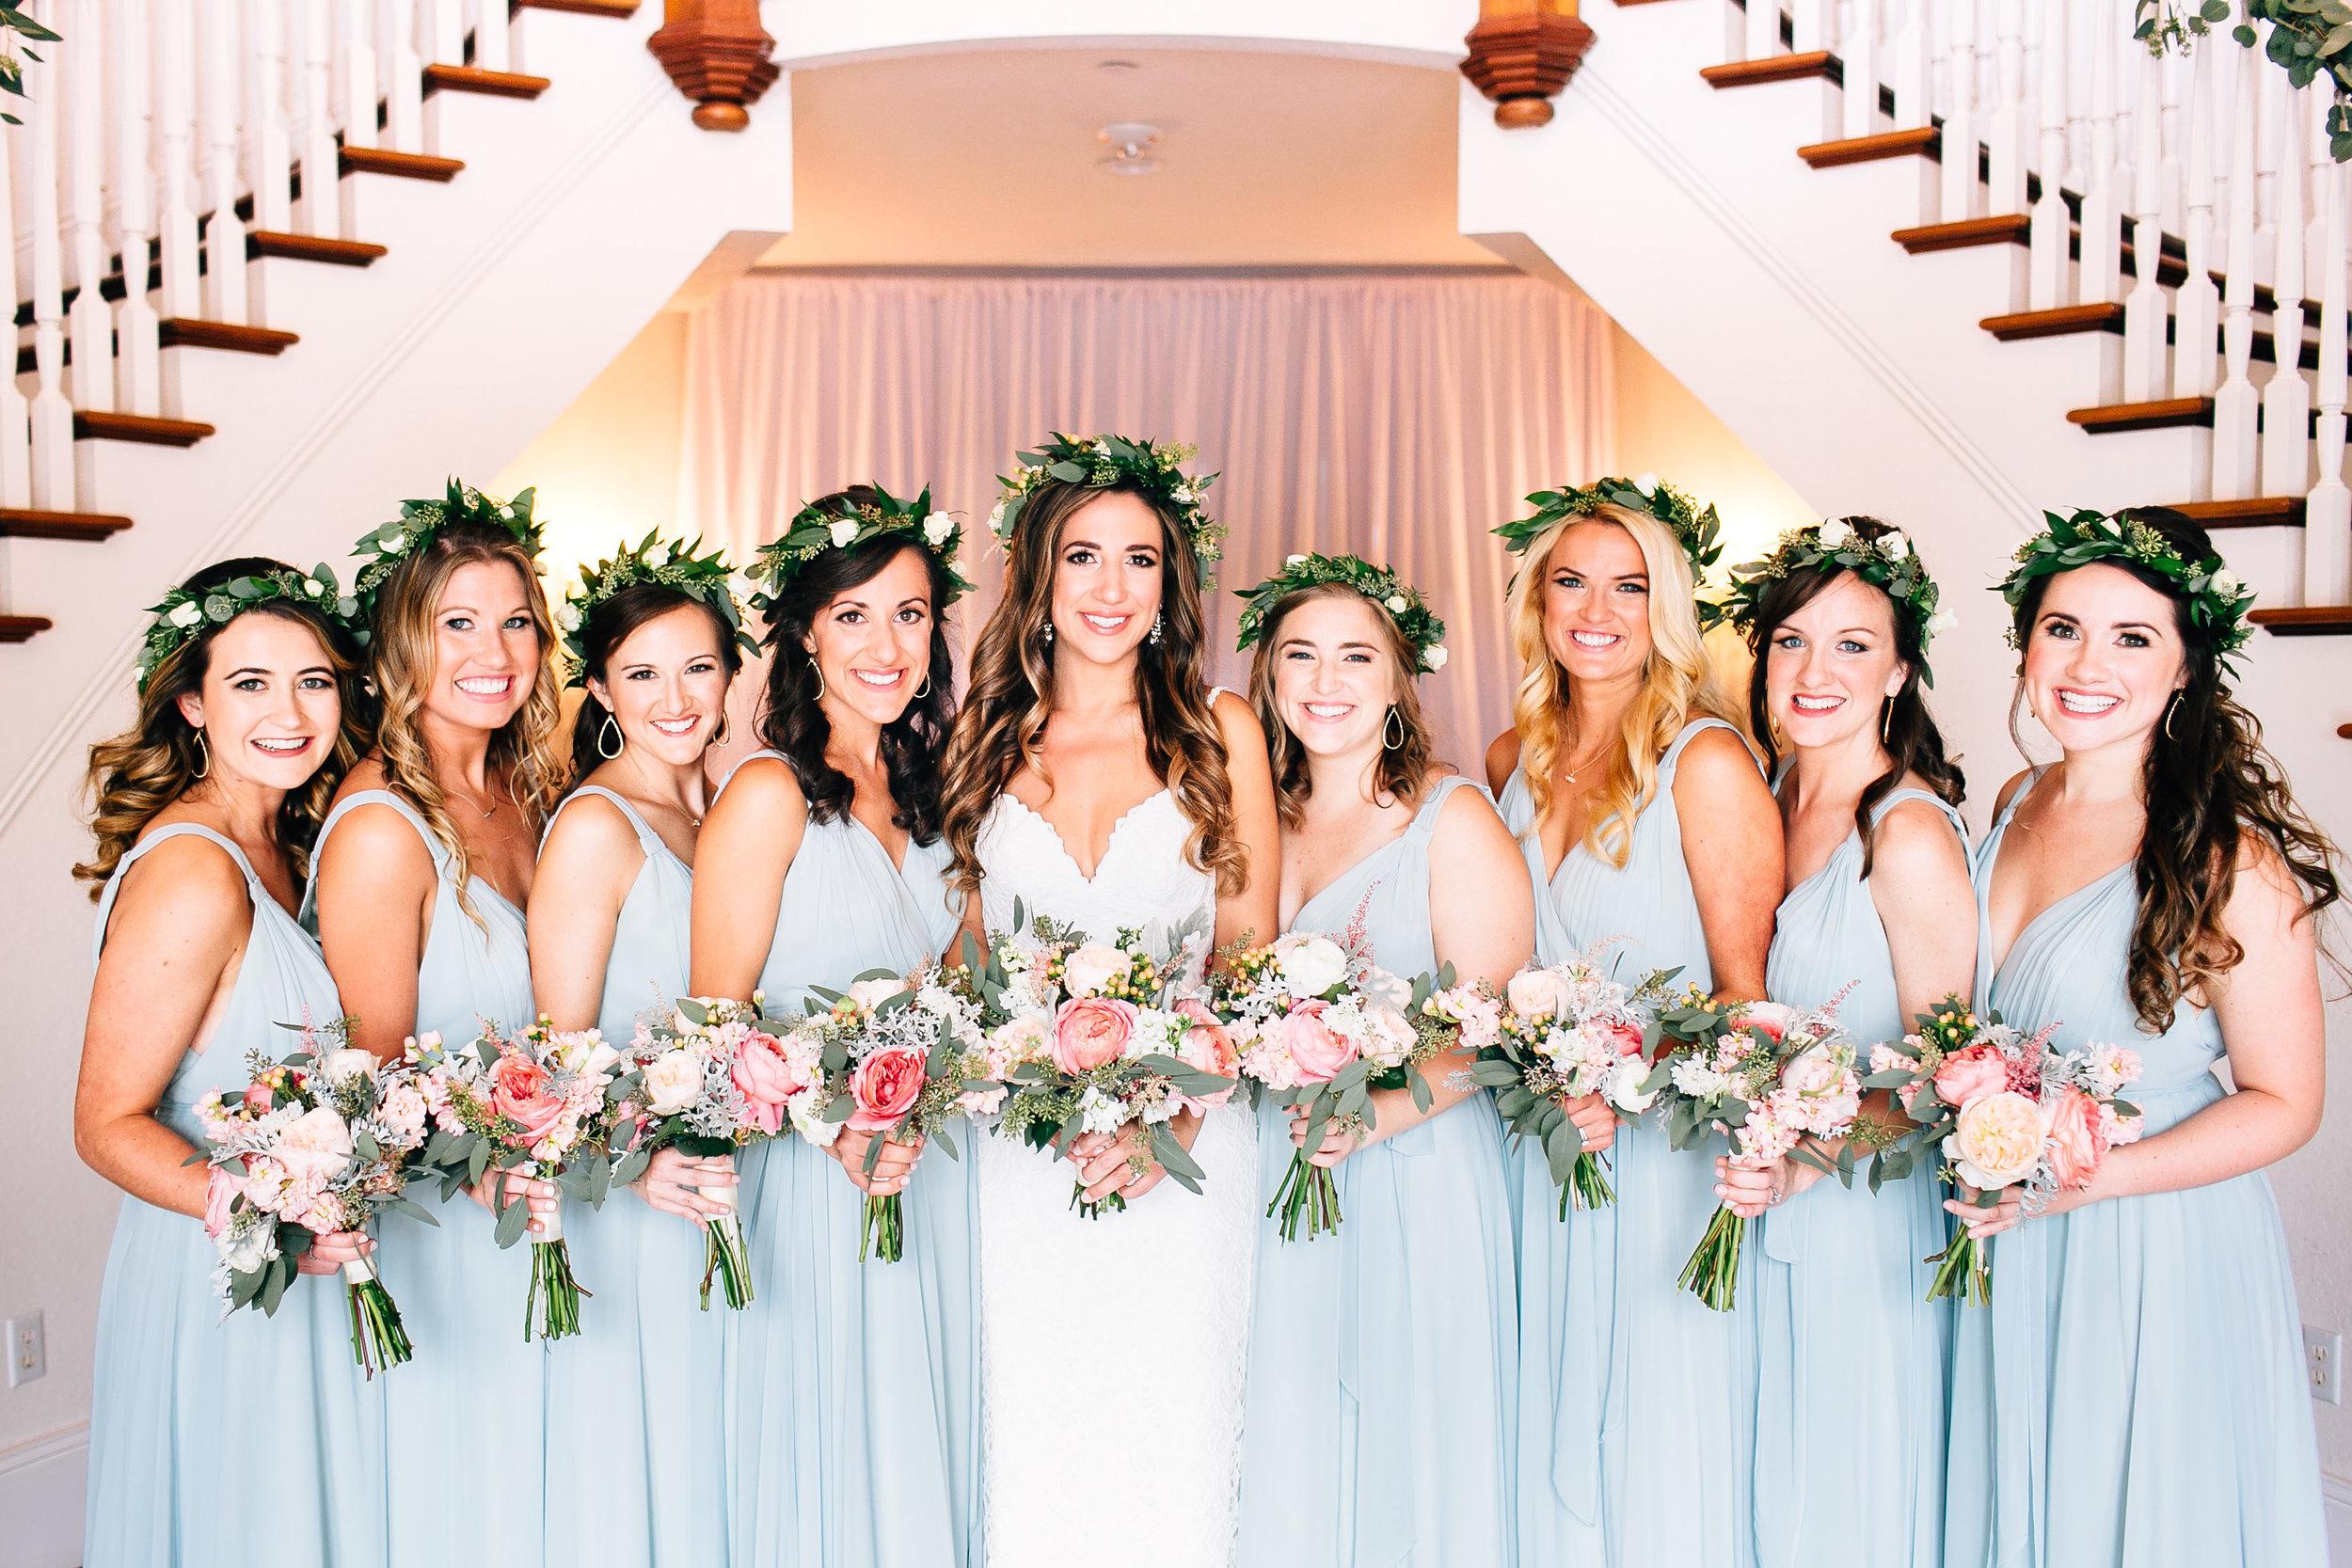 Bridesmaids sage dresses garden bouquets Orlando Wedding Planner Blue Ribbon Weddings